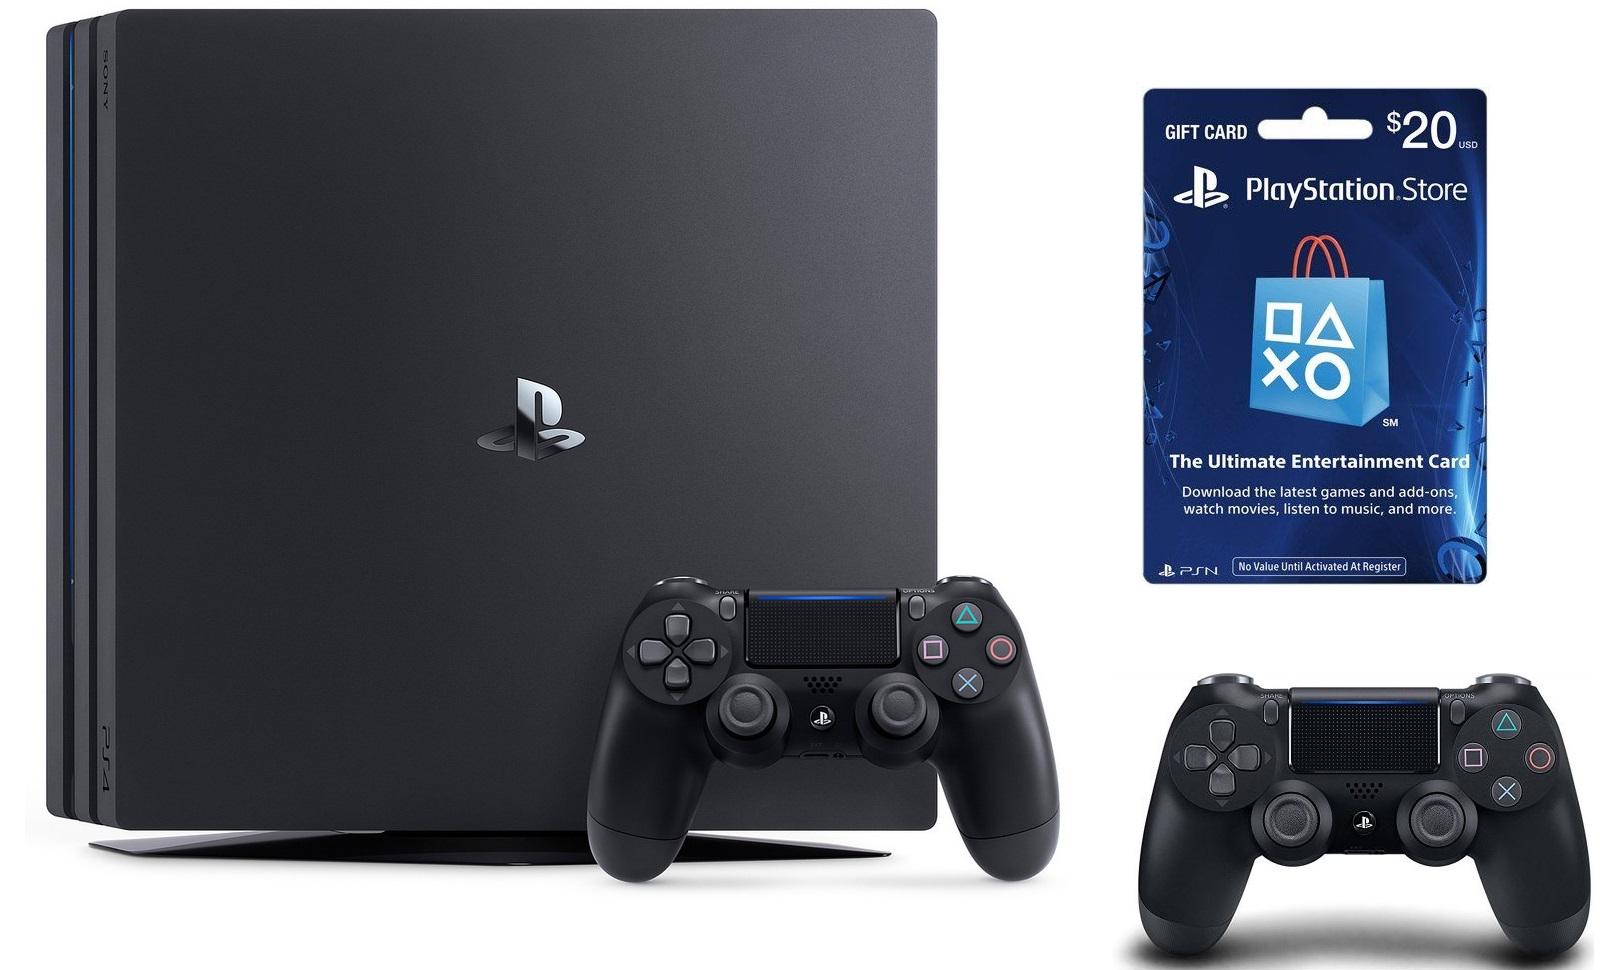 playstation 4 pro bundle deals